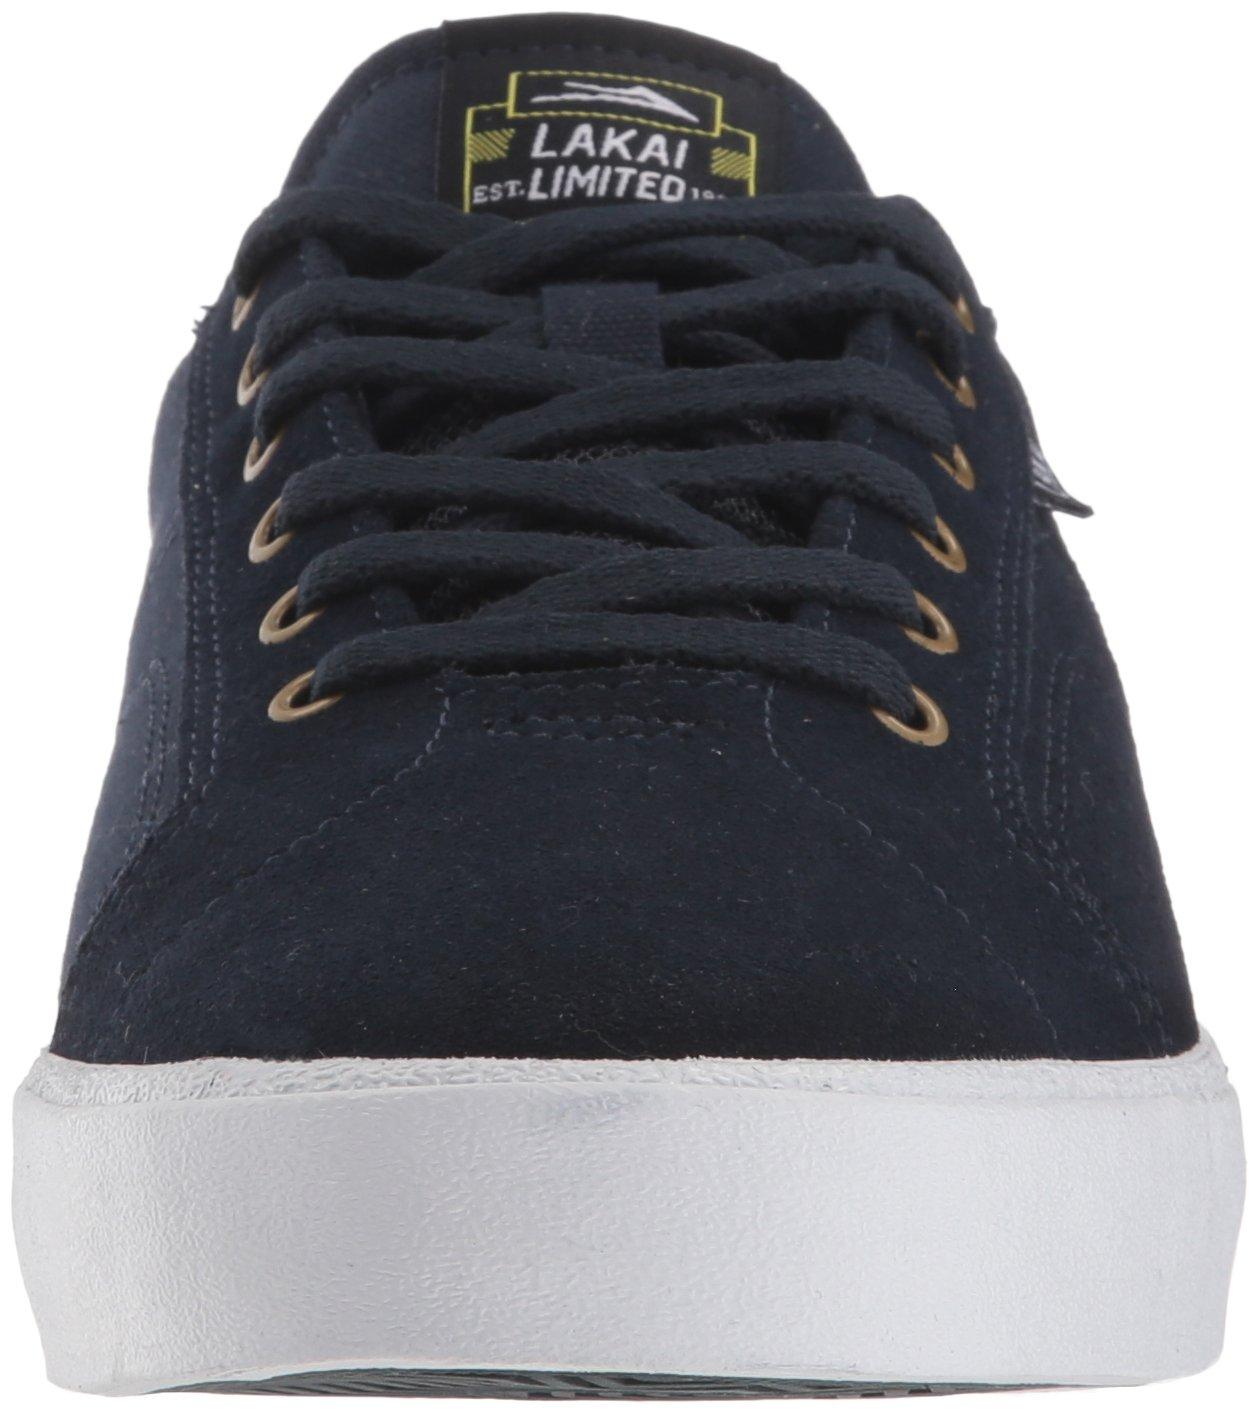 Lakai Flaco M Skate Shoe B073SPPJ7D 7 M Flaco US|Navy/White Suede b4e8e3